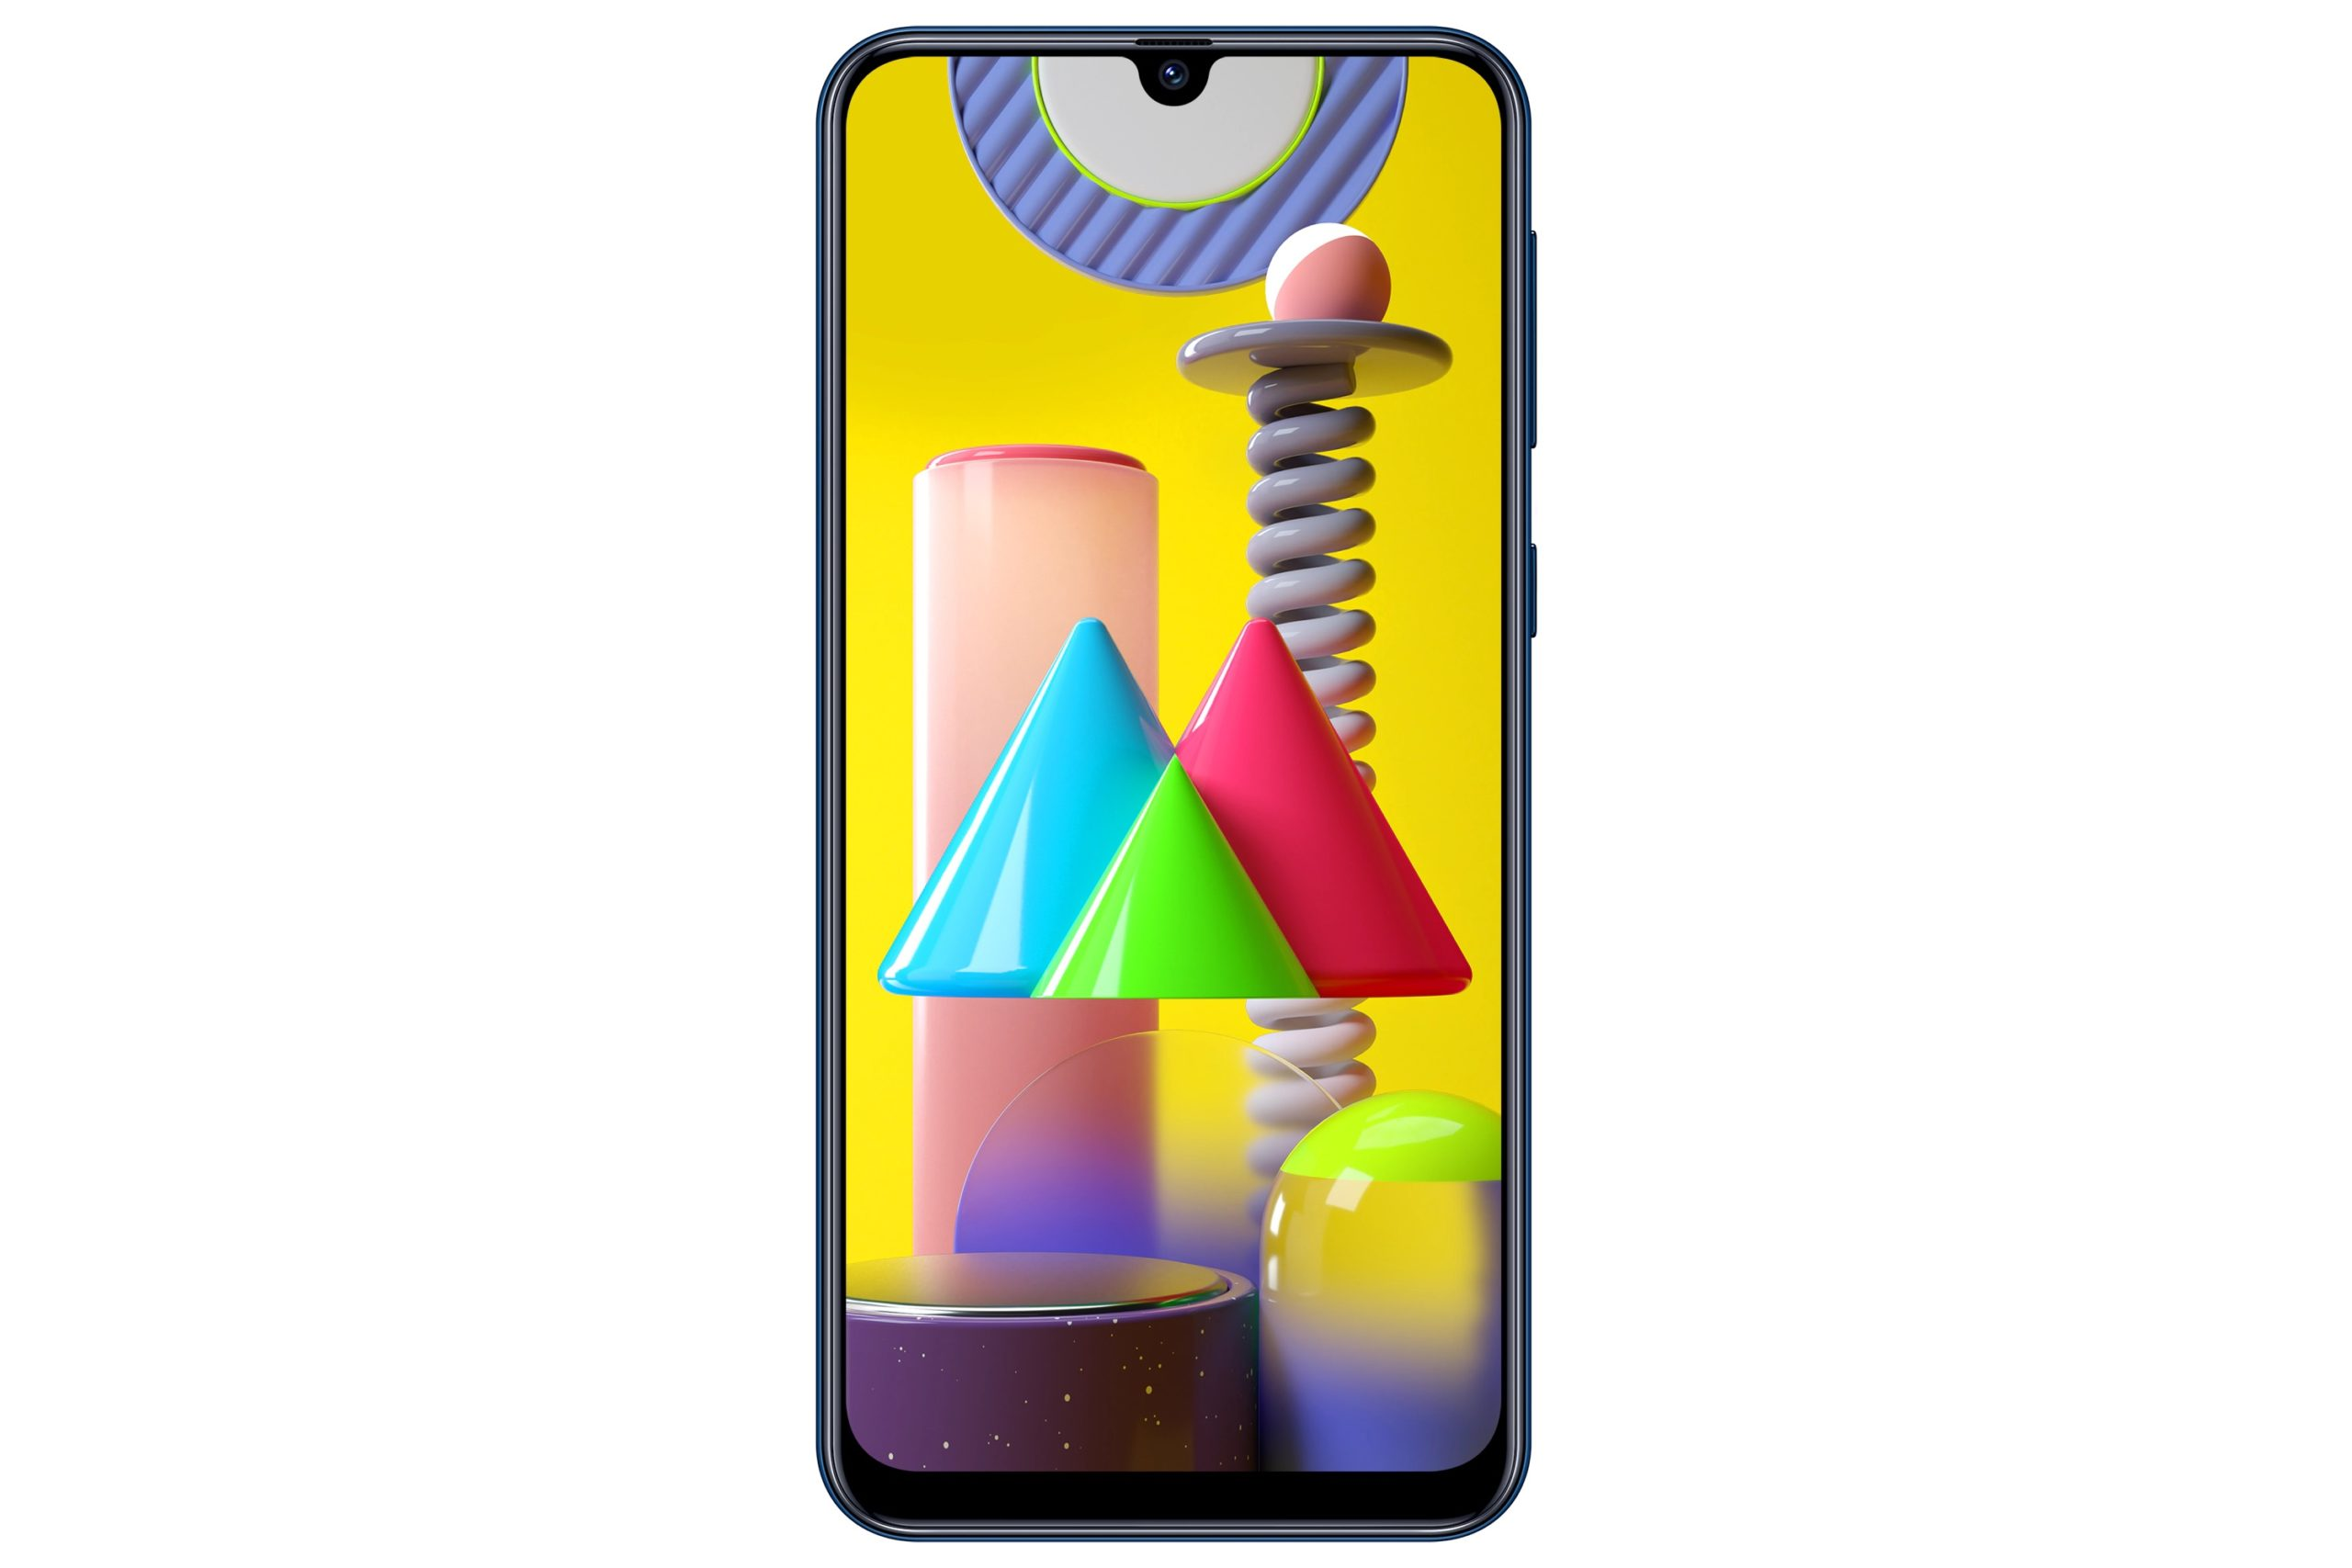 Samsung Galaxy M31: a cheaper alternative